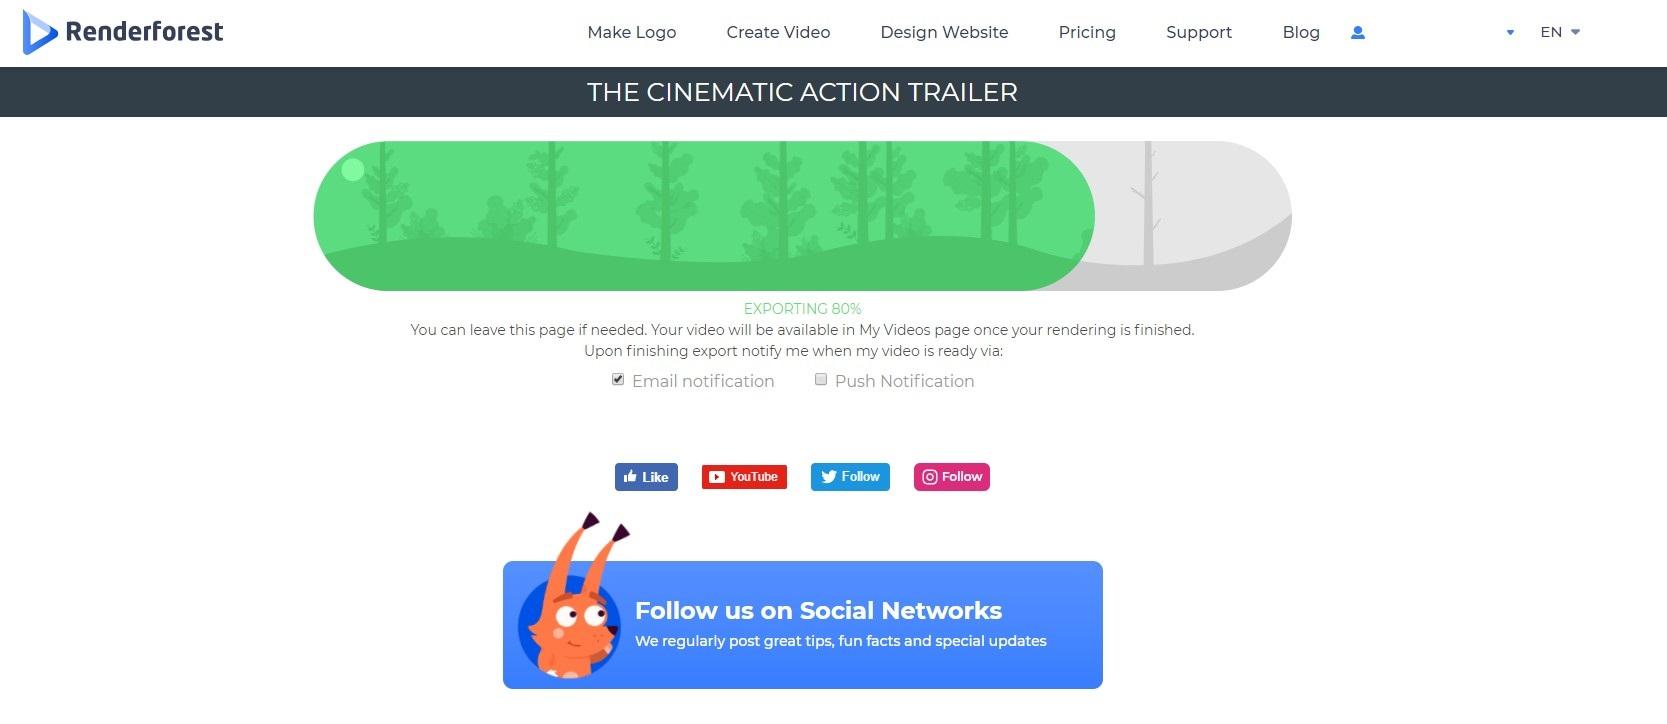 Cinematic Action Trailer - Render